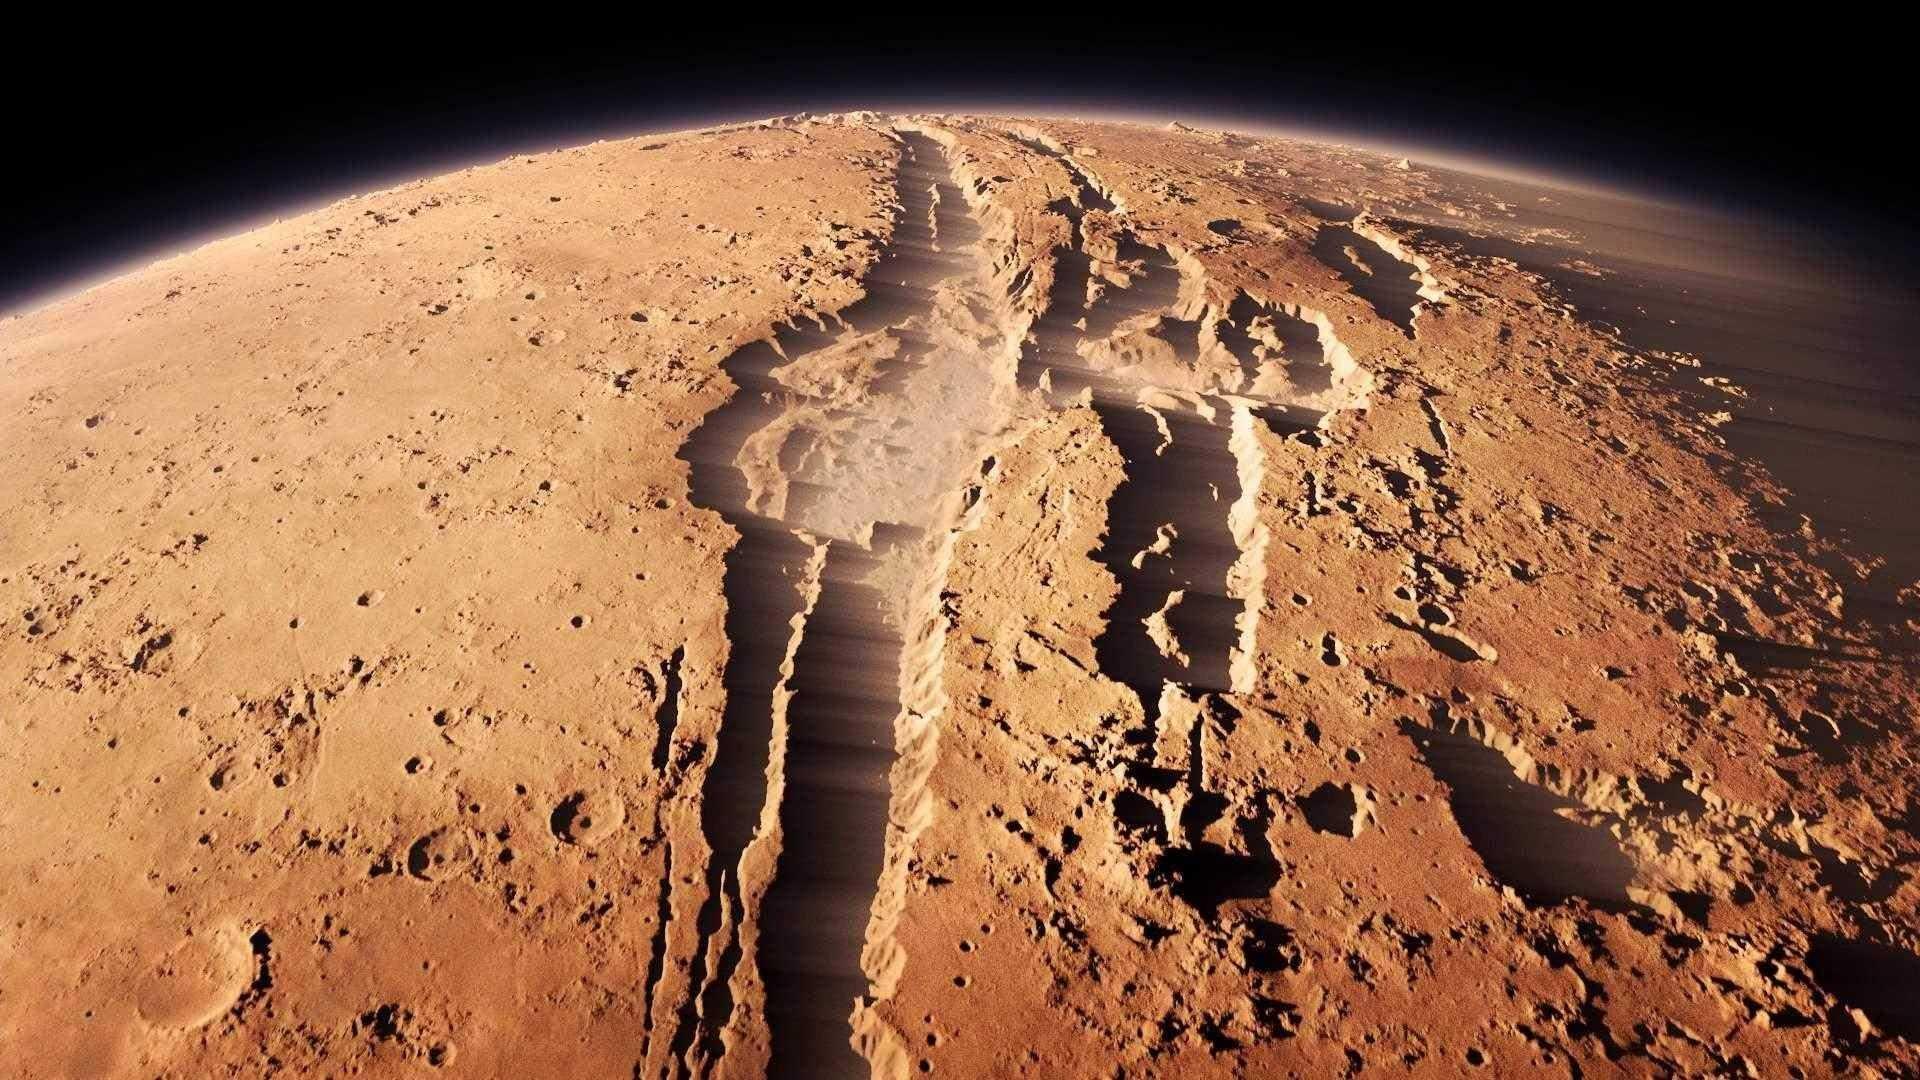 Что узнали о Марсе за прошедший год